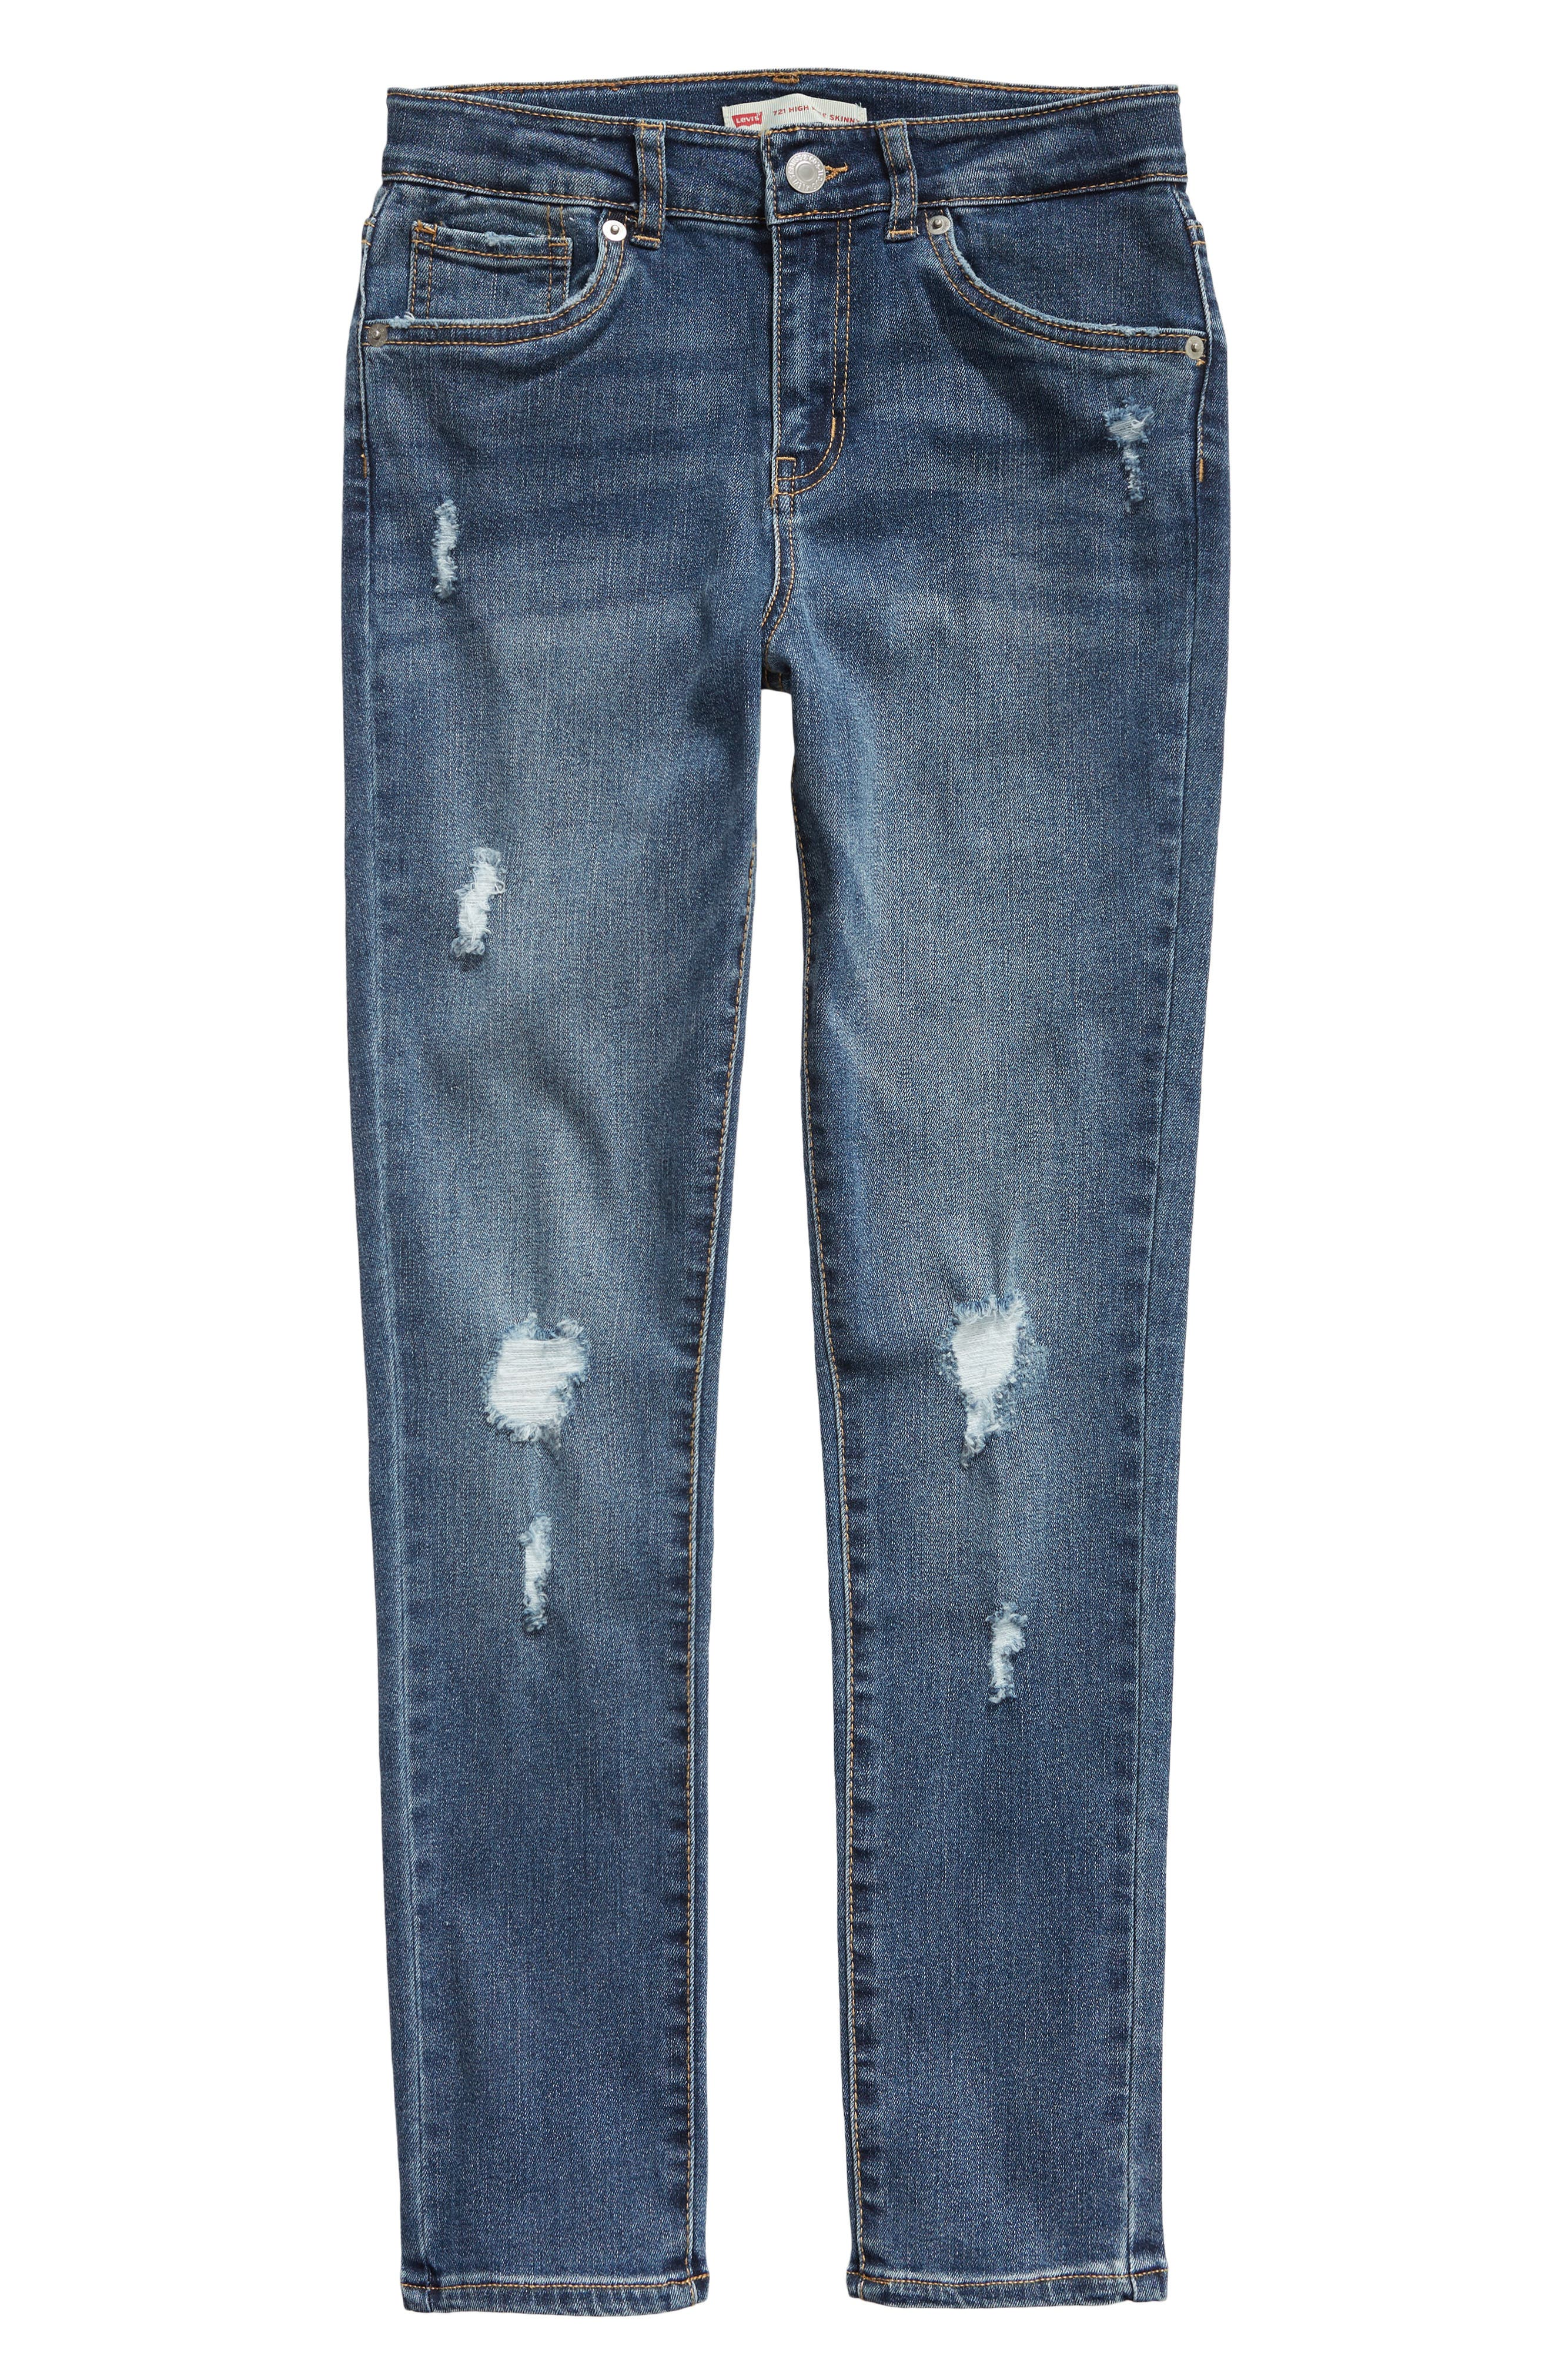 LEVI'S<SUP>®</SUP> 721<sup>™</sup> High Waist Skinny Jeans, Main, color, M7V-MAKE OR BREAK